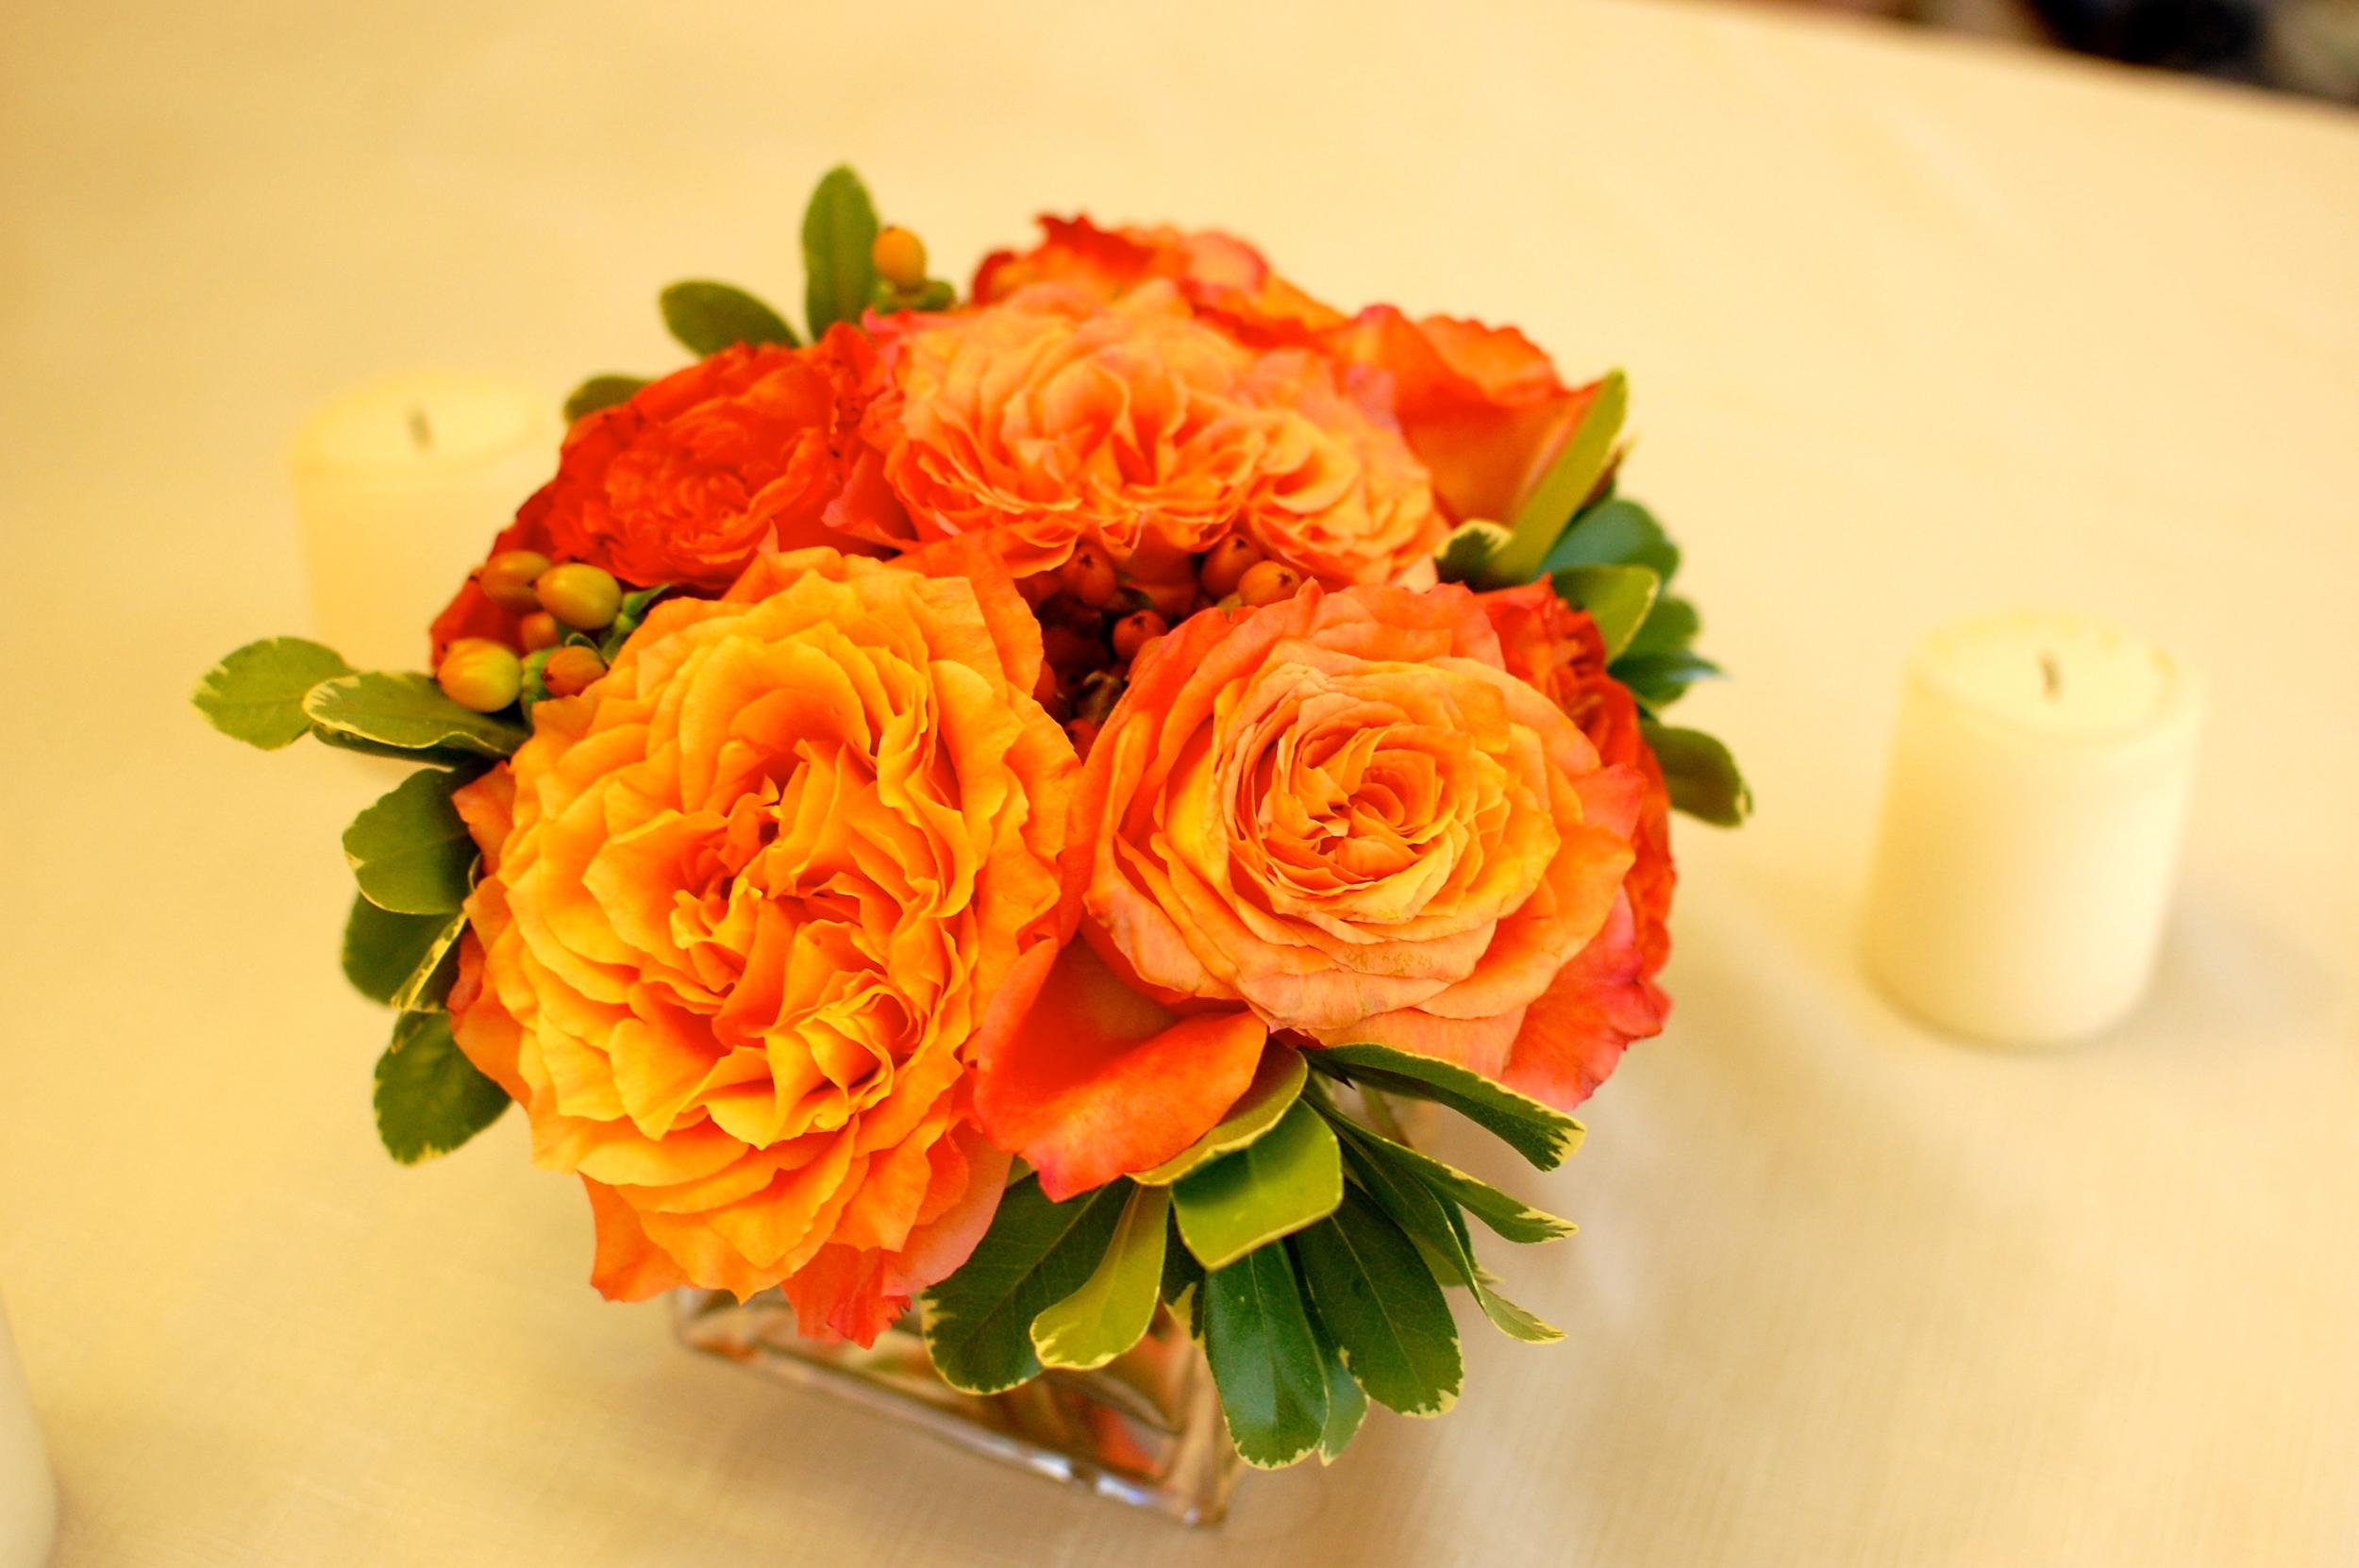 A beautiful fall arrangement of garden roses, hypericum berries and greenery.